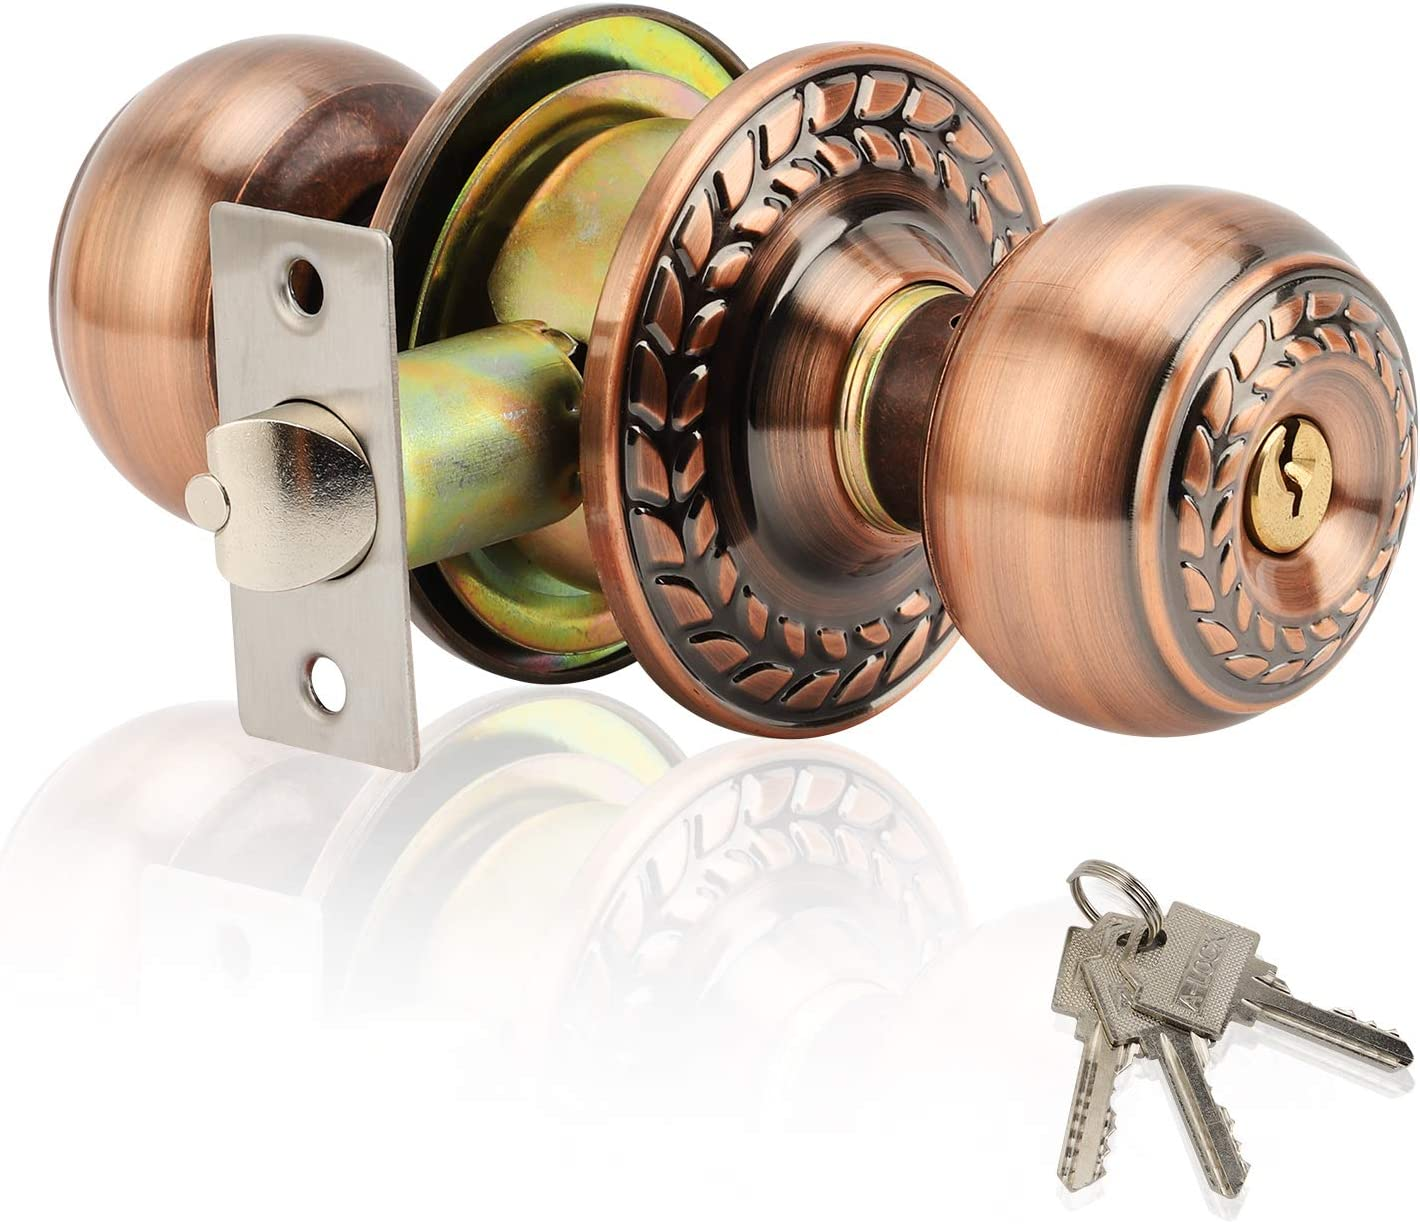 XIUDI Stainless Steel Door Knobs with Lock and Key for Bedroom,Interior Privacy Door Knobs with keypad,Ball Entry Door Handle Bronze,Entrance Privacy/Bedroom (Classic Bronze)